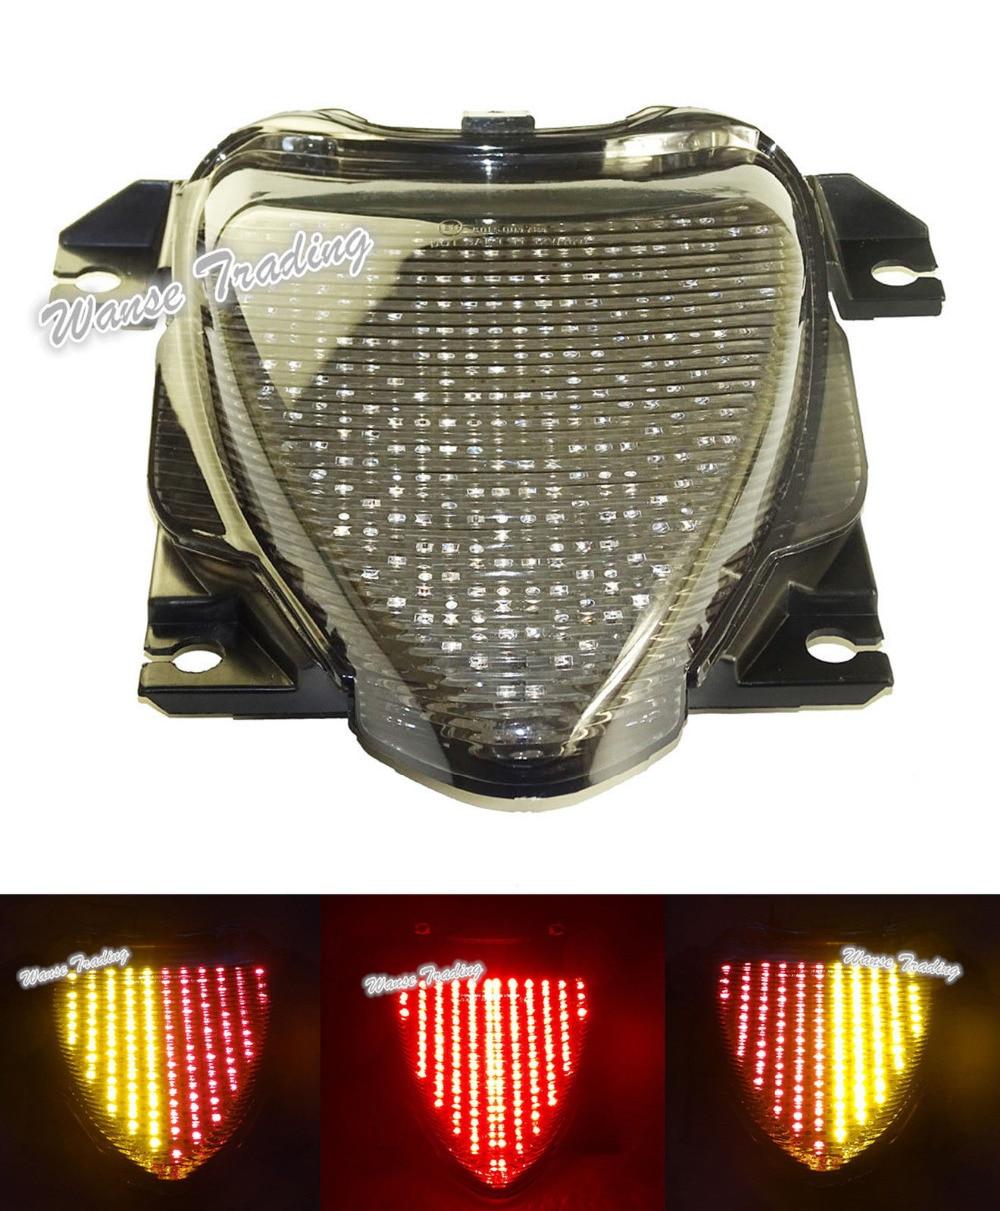 For suzuki boulevard m109r vzr1800 m1800r 2006 2007 2008 2015 e mark rear tail light brake turn signals integrated led light